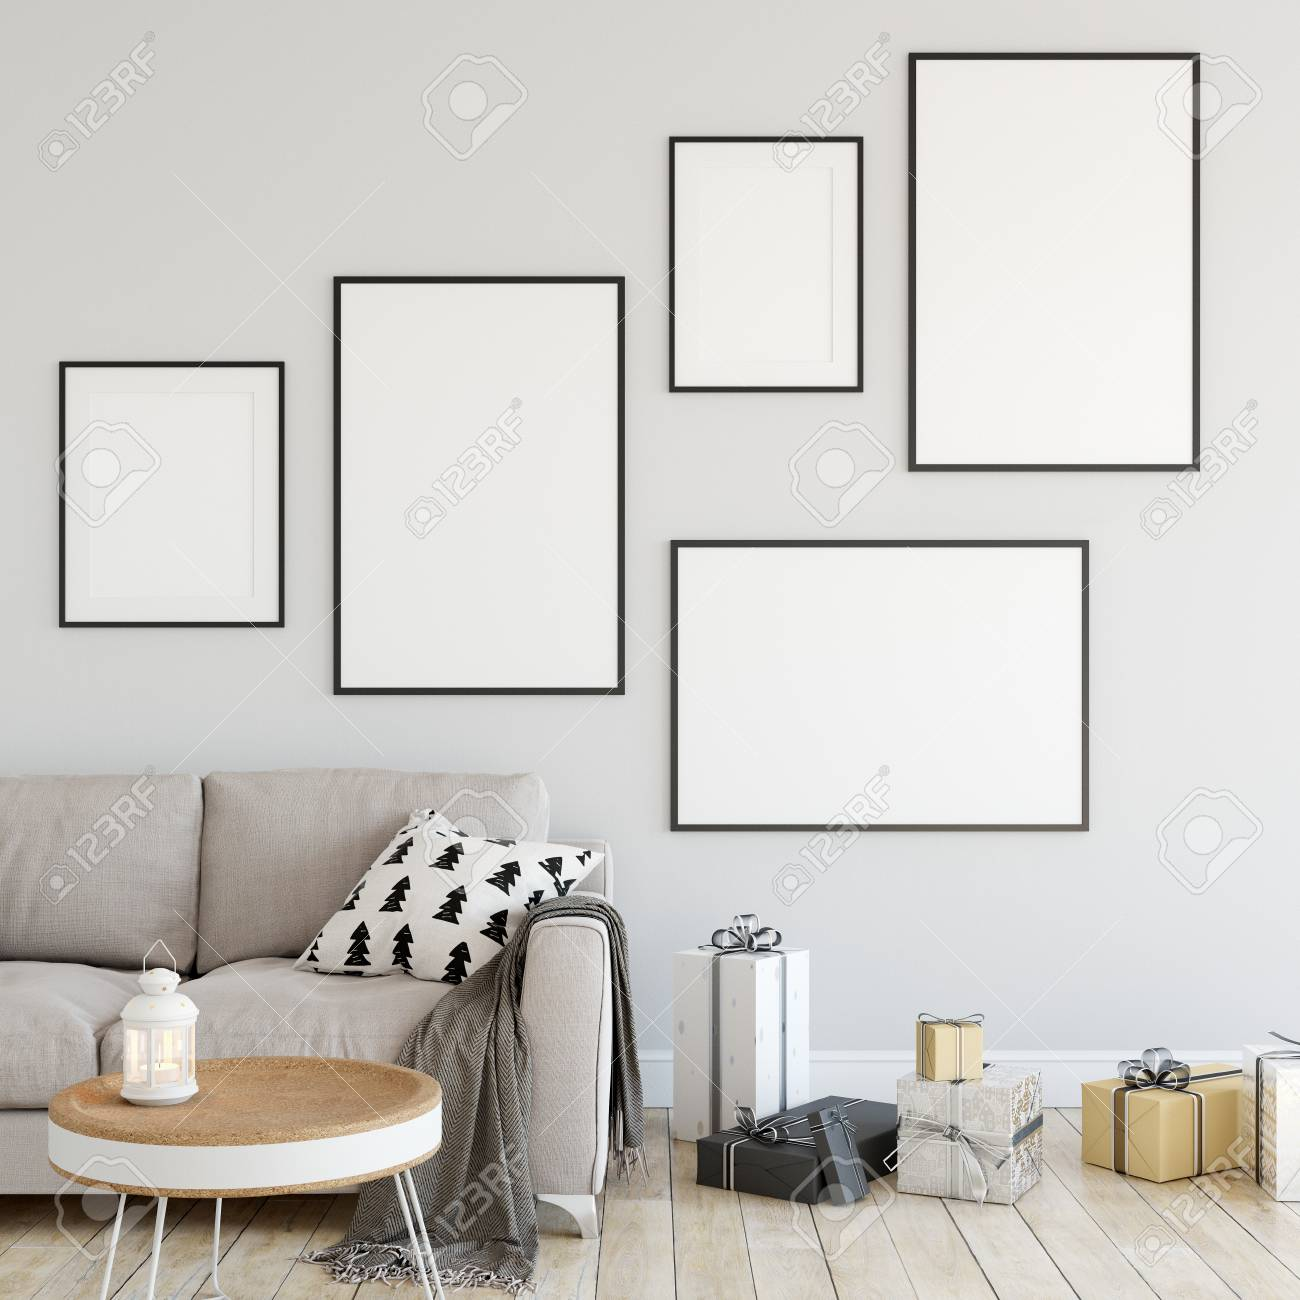 Posters Mock Up In Living Room. Interior Scandinavian Style... Stock ...